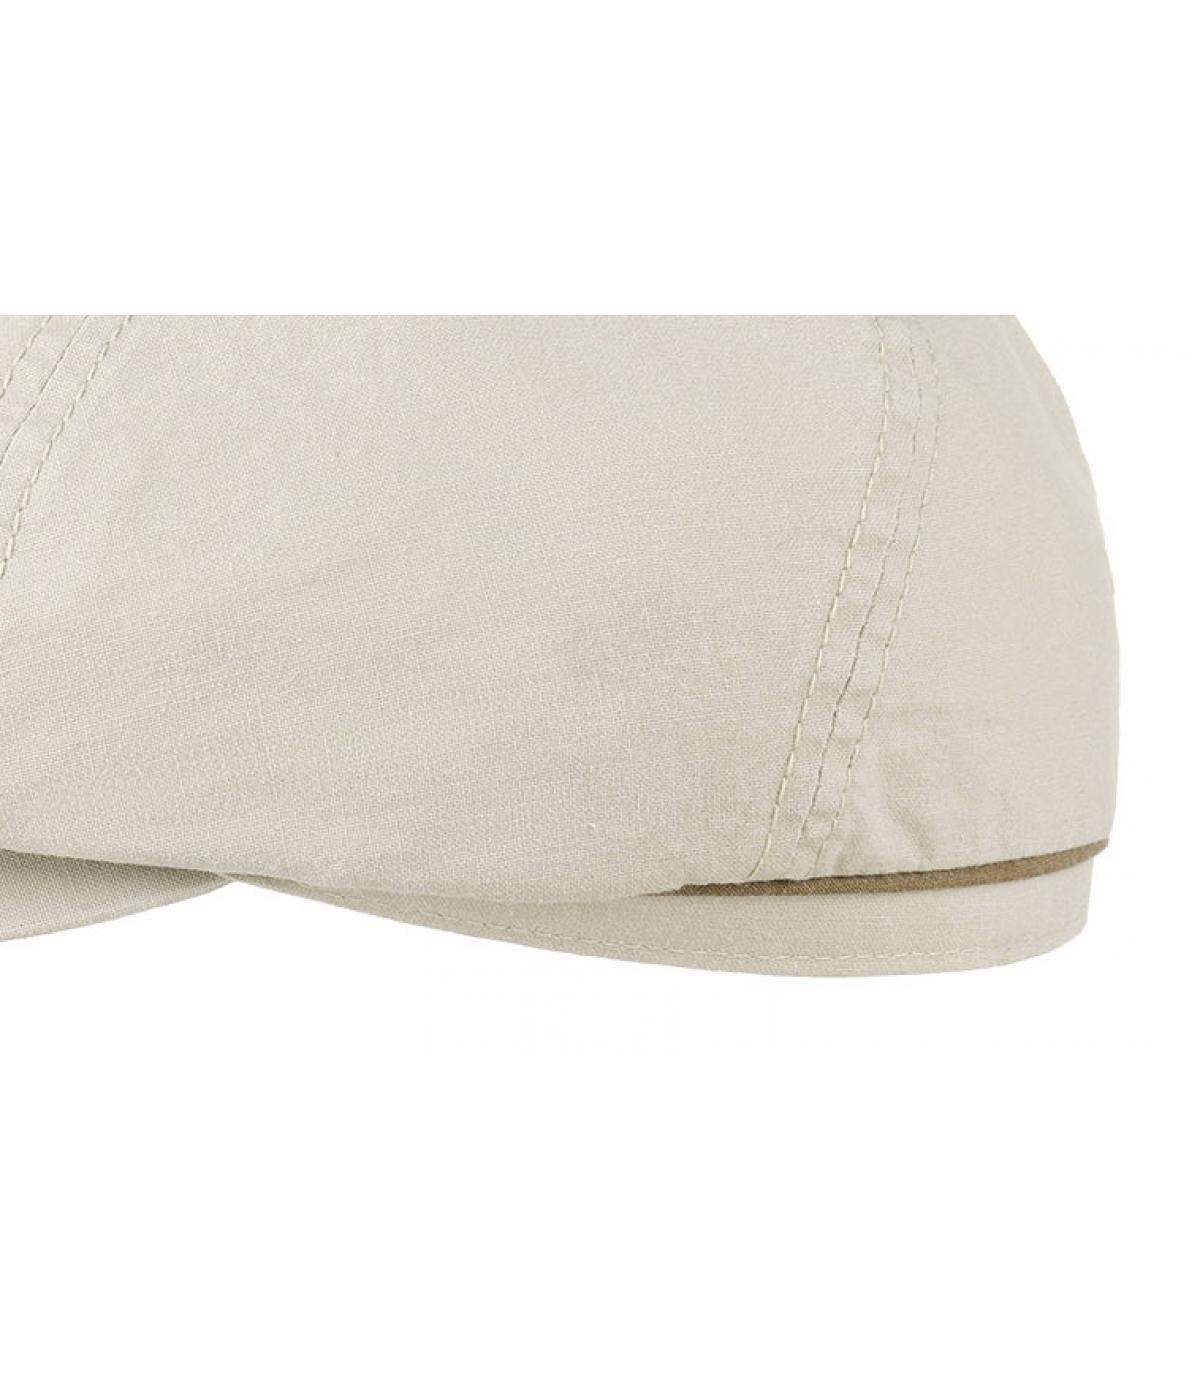 Details Brooklyn cap waxed cotton organic beige - Abbildung 3